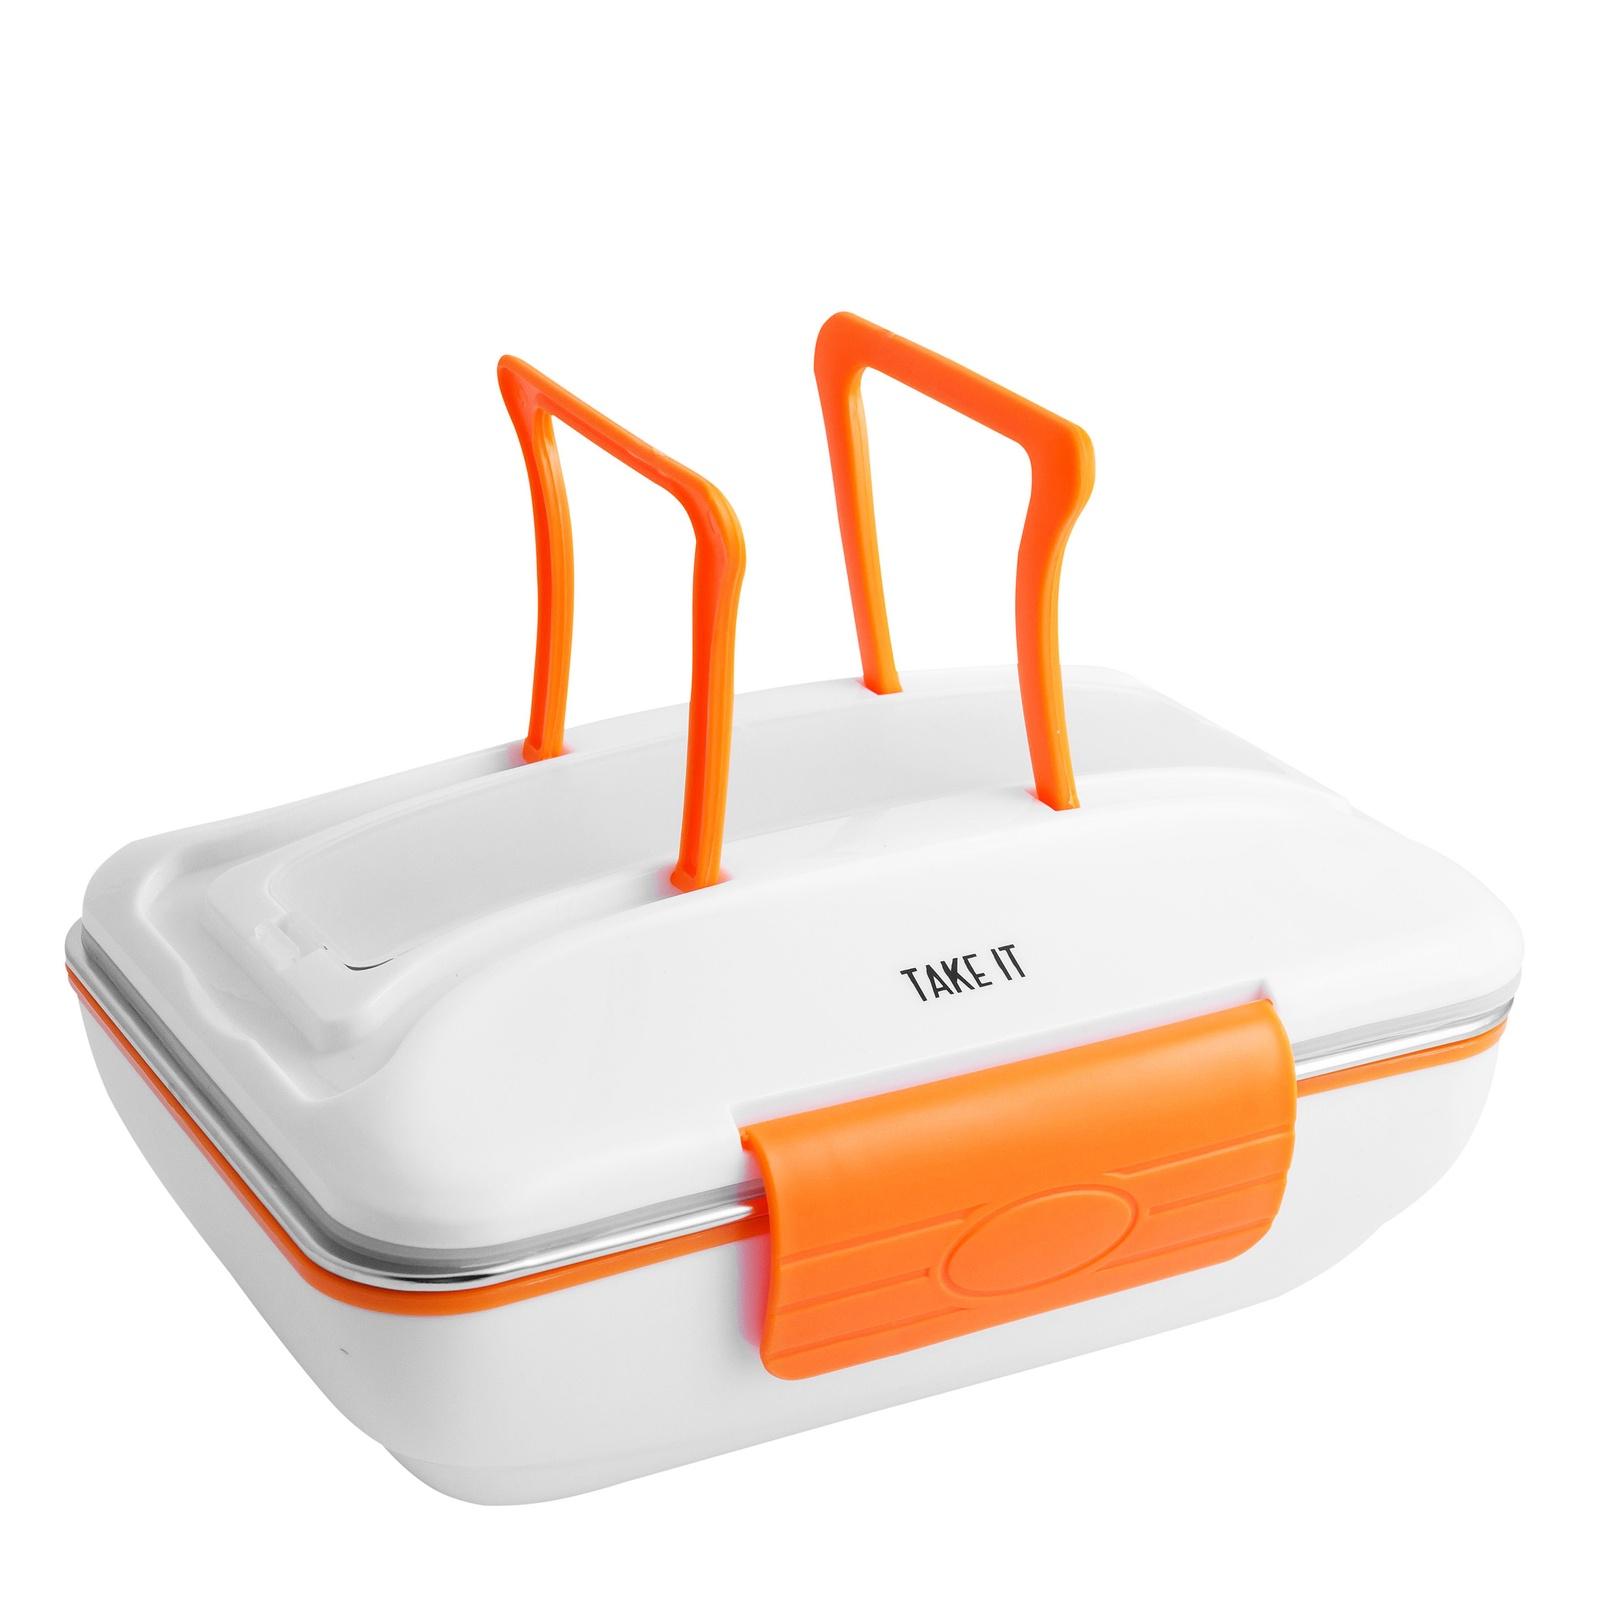 Ланч-бокс TAKE IT с подогревом, от сети 220В, белый, оранжевый Take It